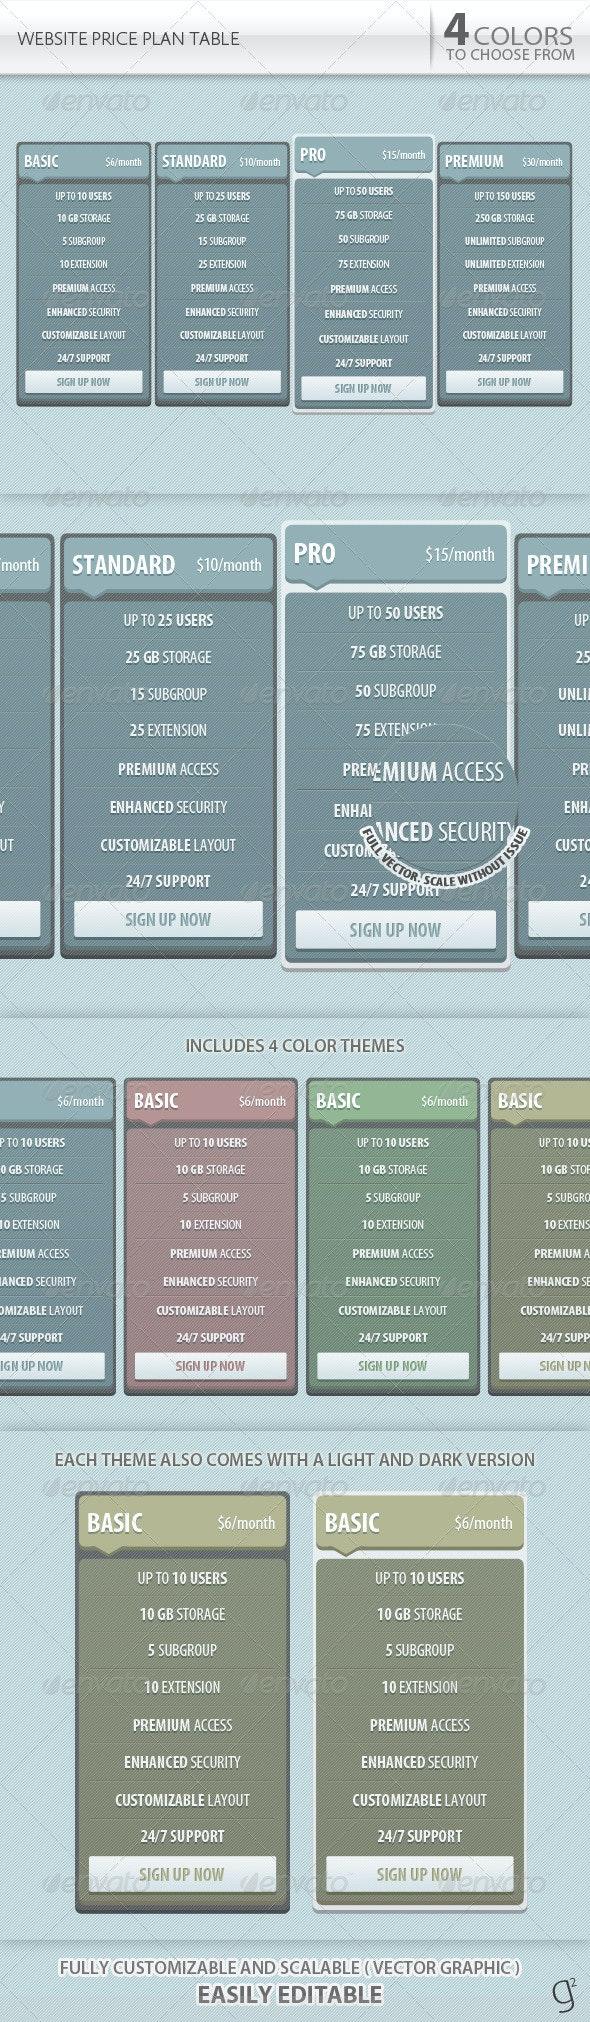 Website Price Plan Table